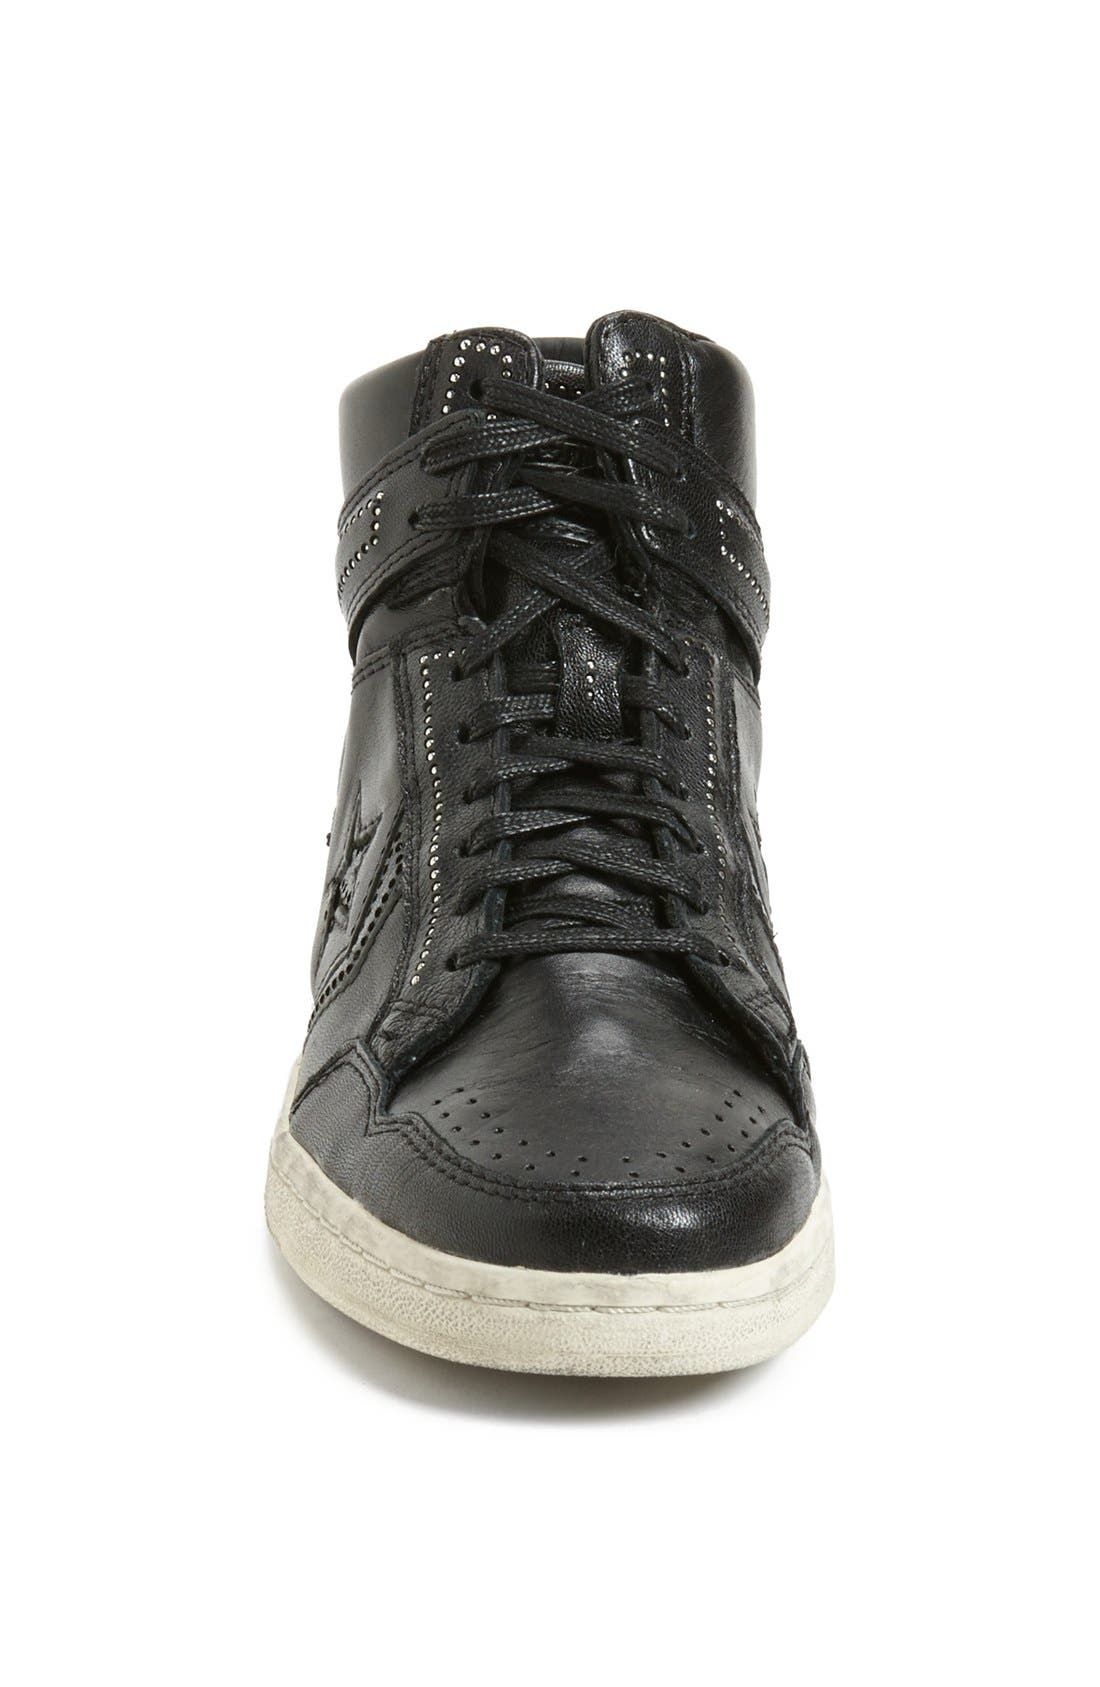 Alternate Image 3  - Converse by John Varvatos 'JV Weapon' Sneaker (Men)